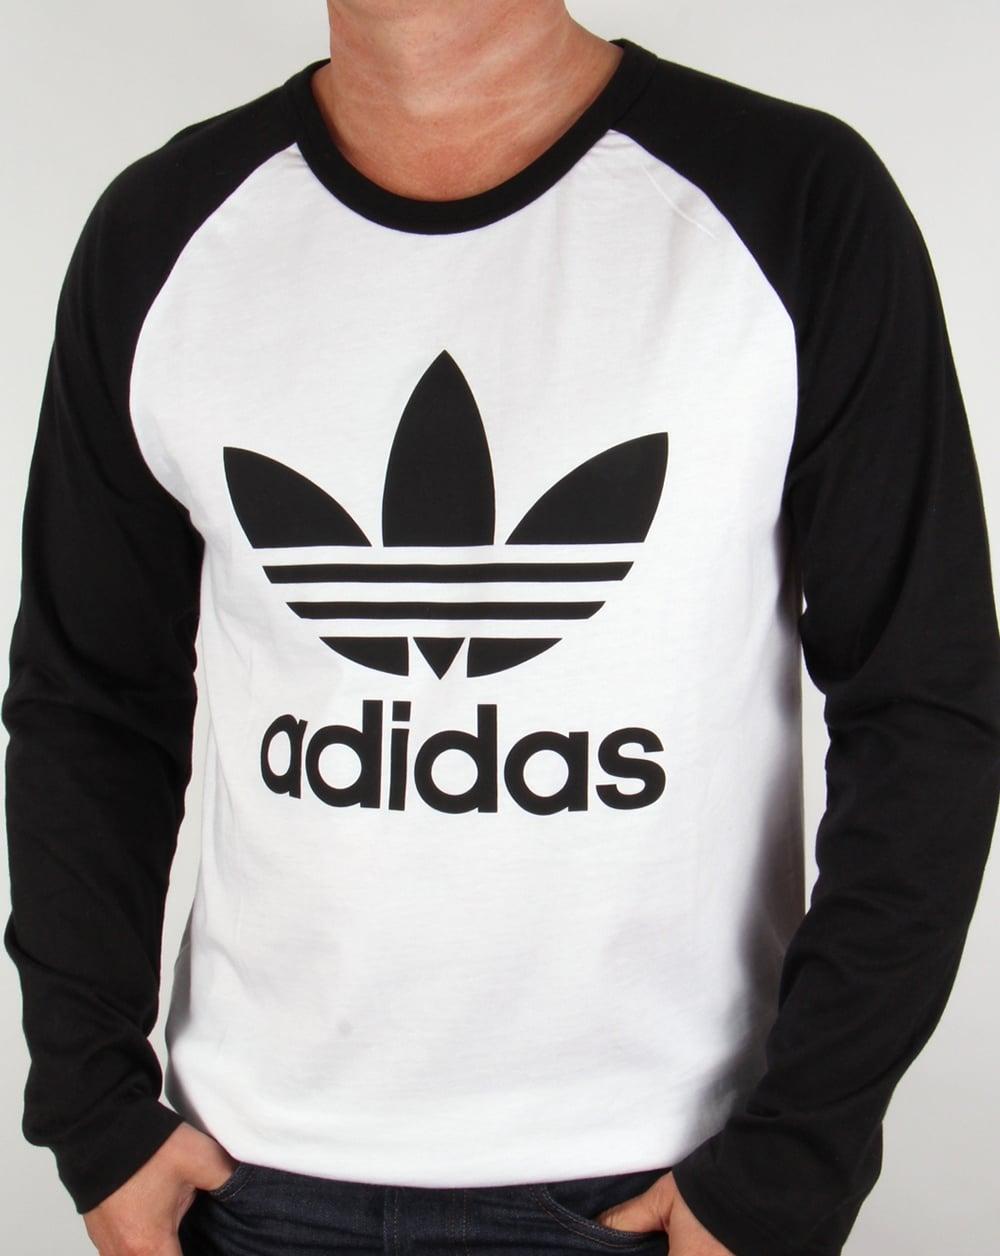 reasonable price classic style wholesale outlet Adidas Originals Trefoil Long Sleeve Raglan T-shirt White/black